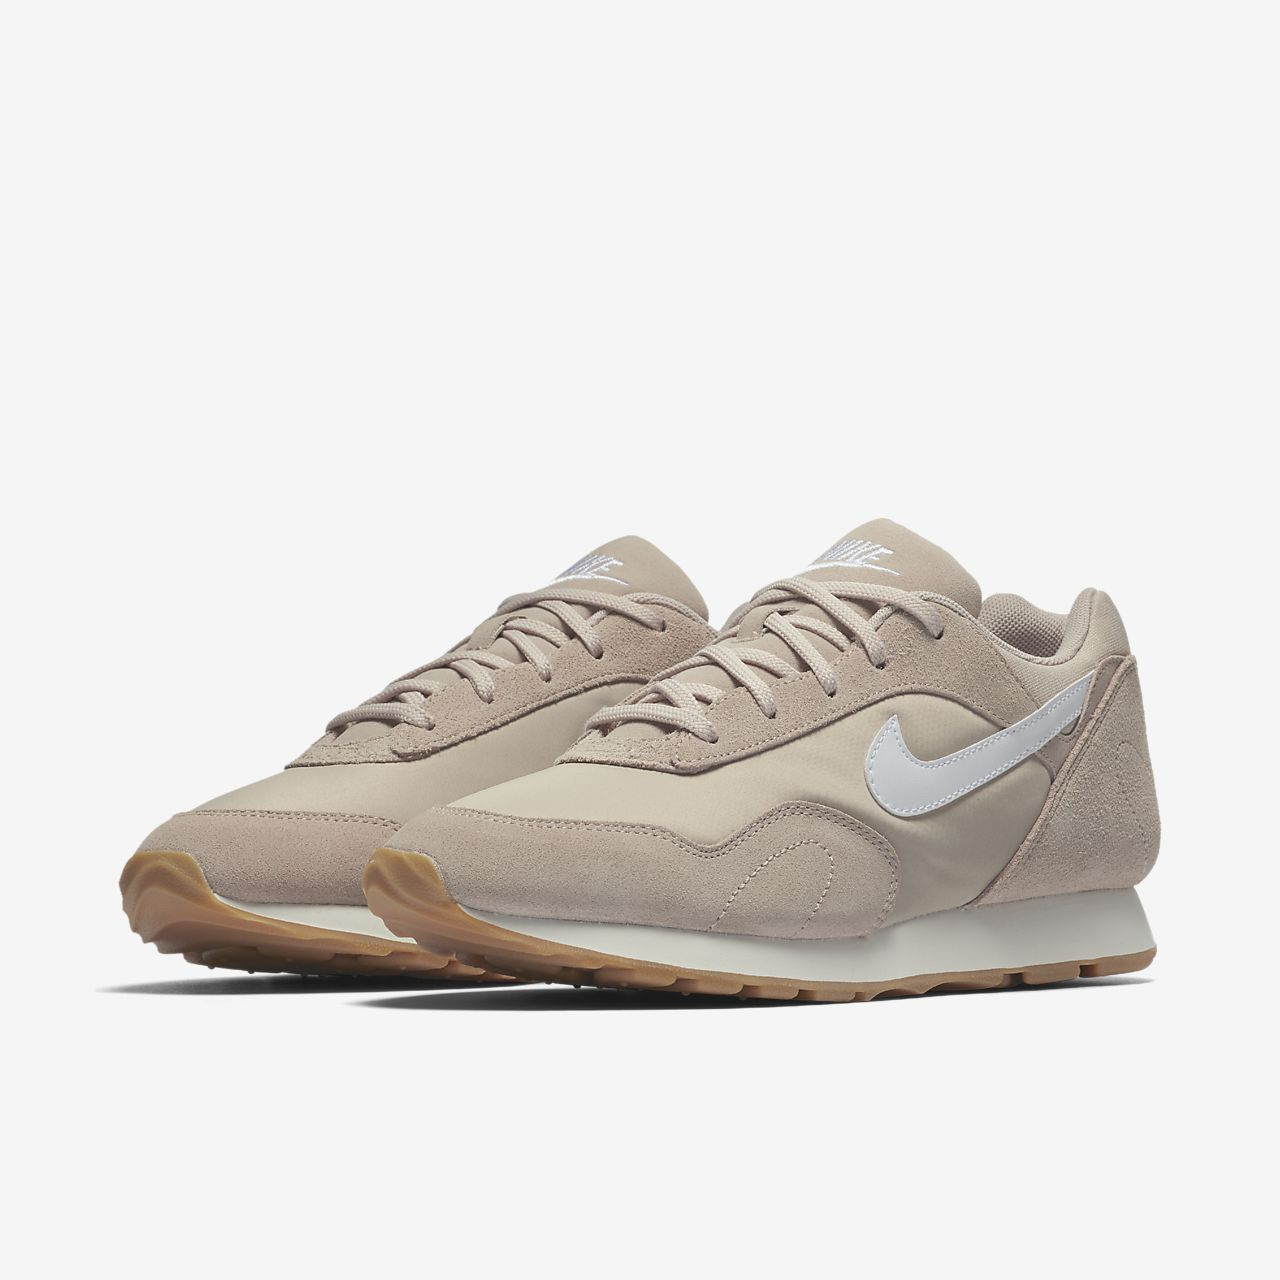 pretty nice a4650 dc0d6 Low Resolution Nike Outburst Women s Shoe Nike Outburst Women s Shoe